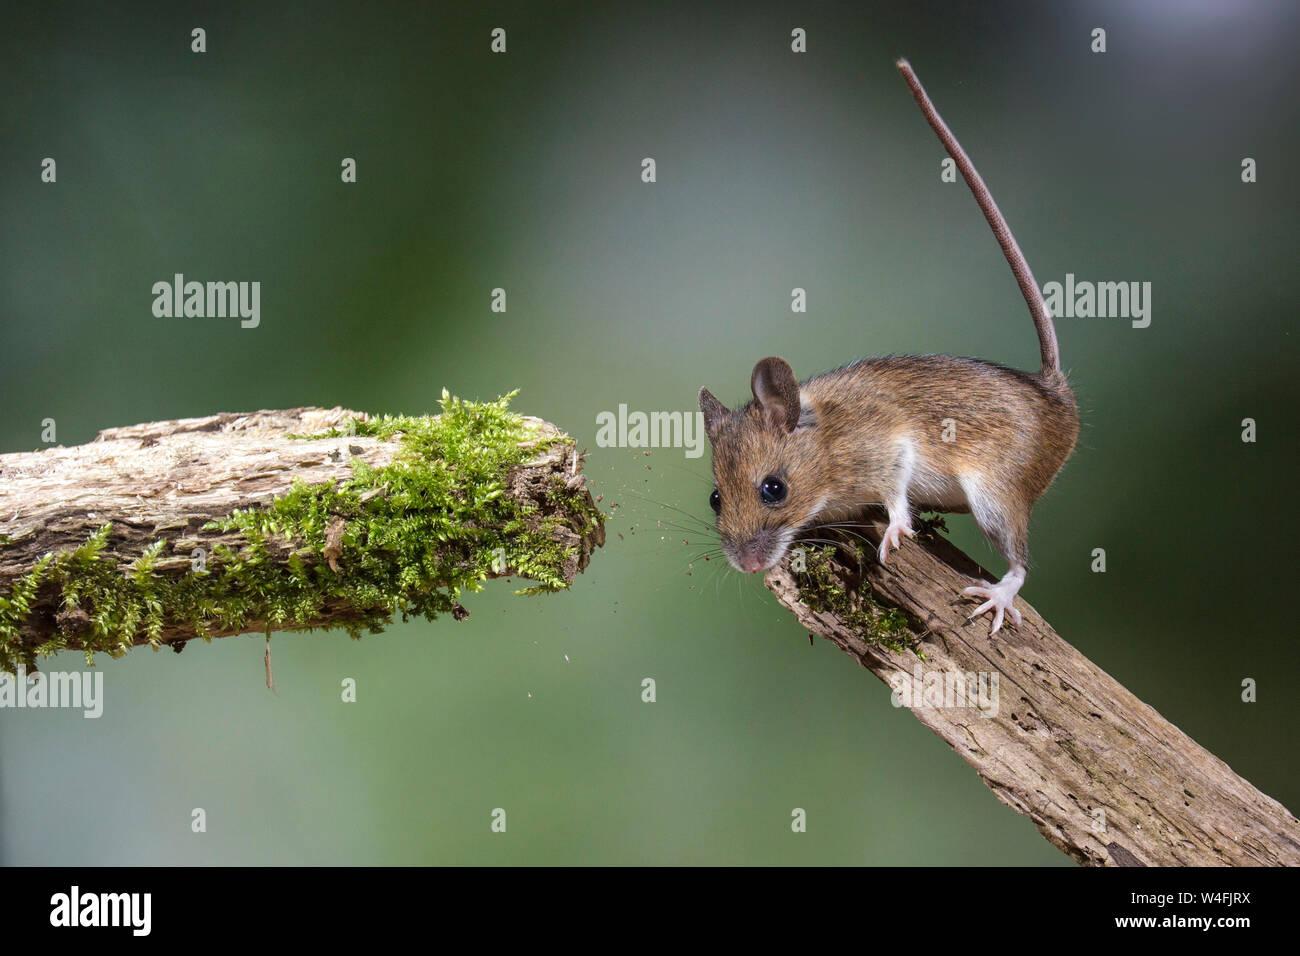 Wood mouse, Waldmaus (Apodemus sylvaticus) Stock Photo